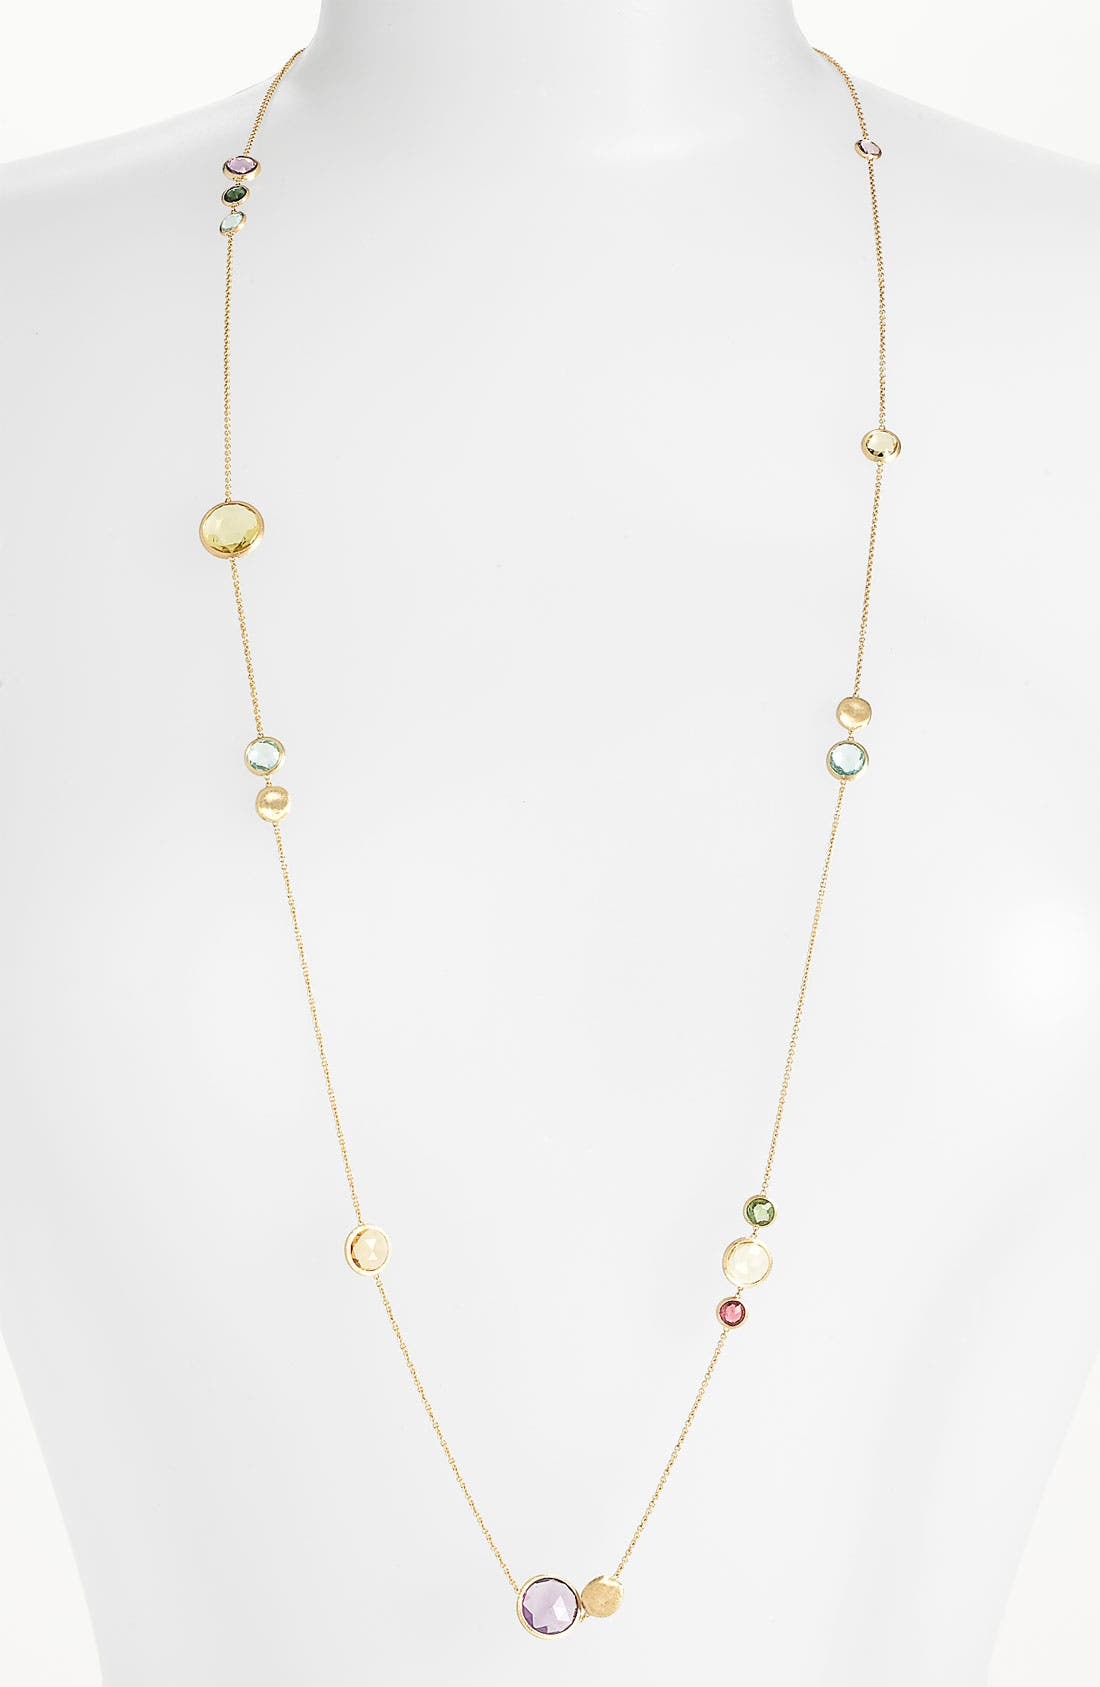 Alternate Image 1 Selected - Marco Bicego 'Jaipur' Long Station Necklace